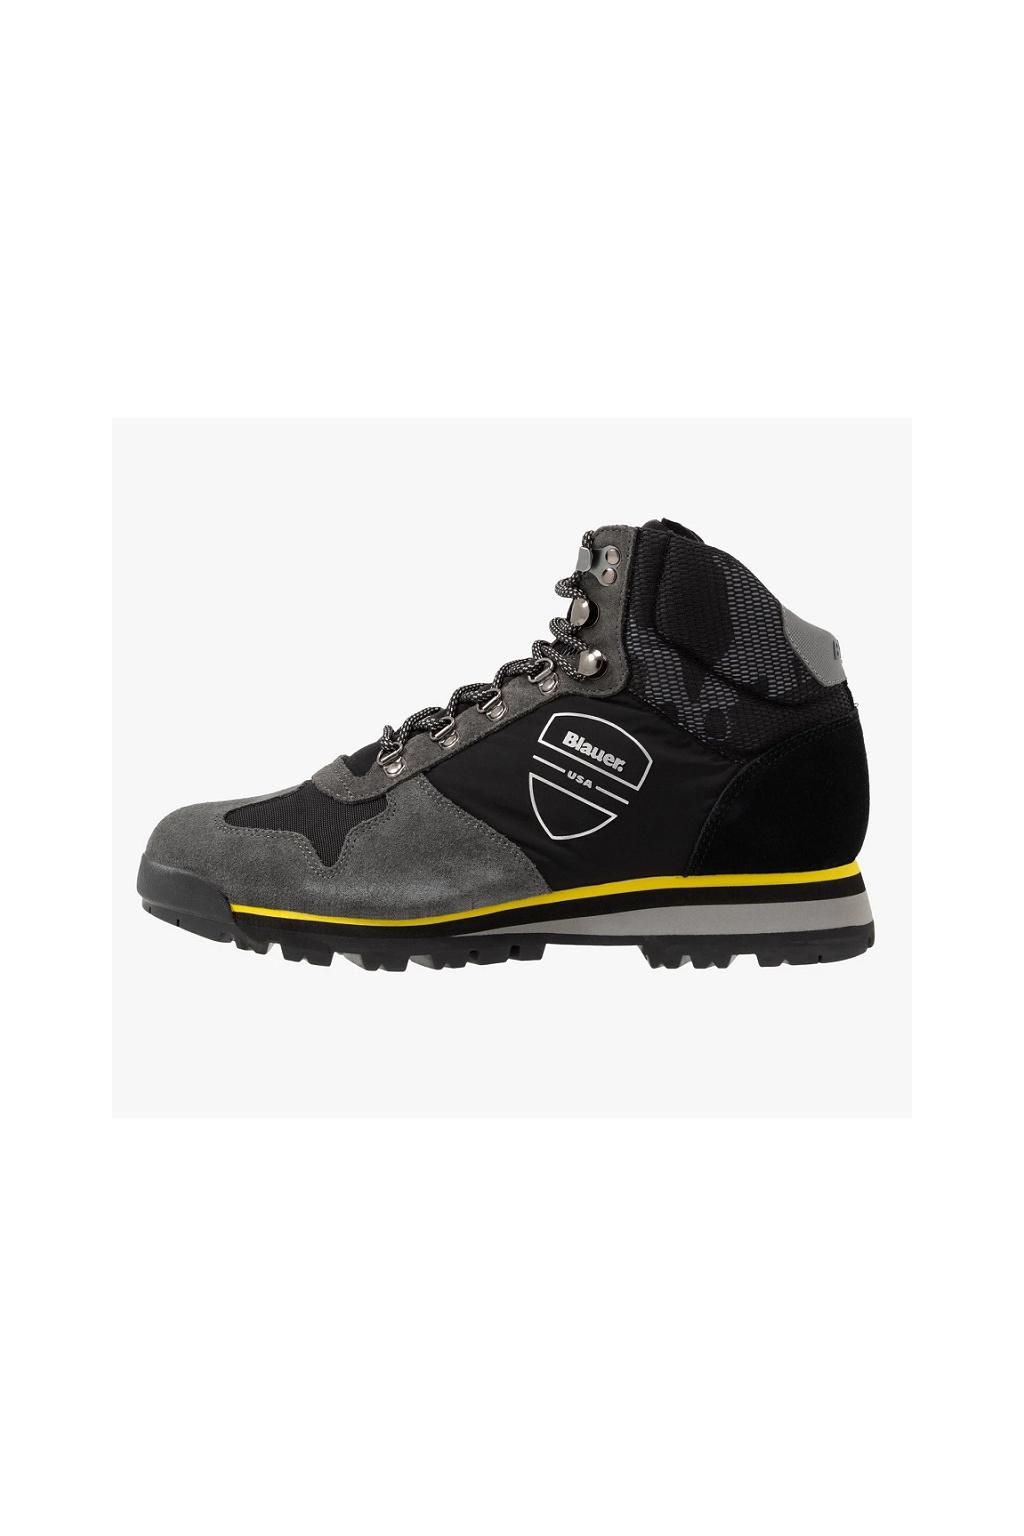 F0AKRON01 Pánská obuv Blauer Akron černá